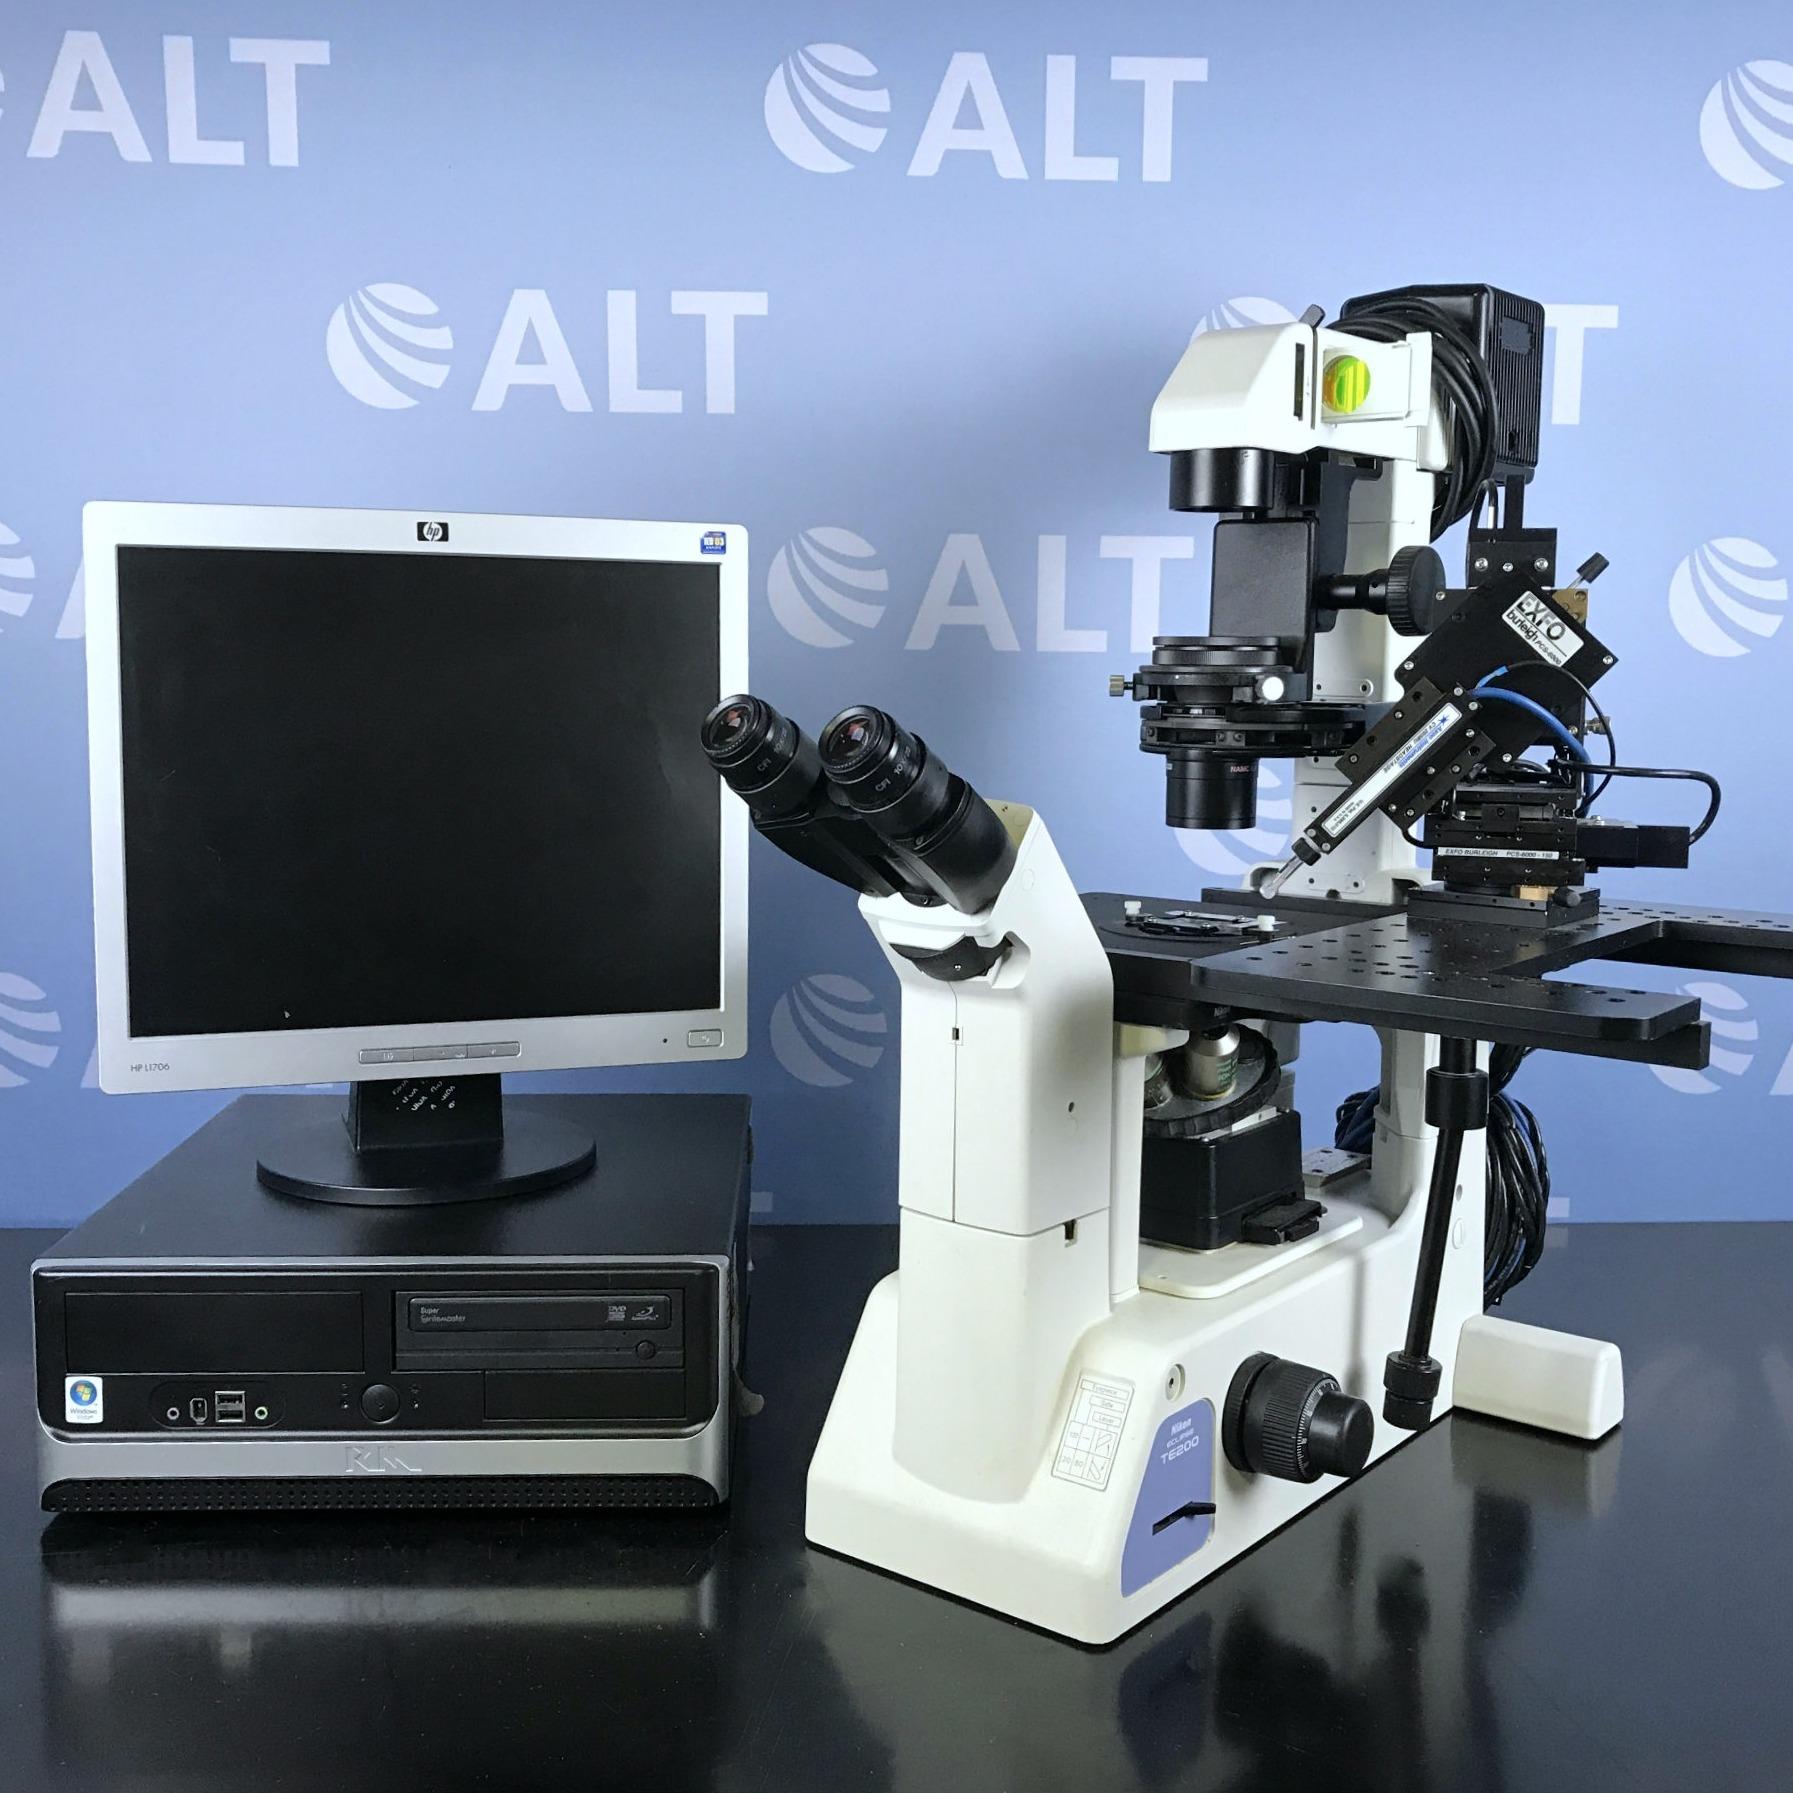 Eclipse TE200 Inverted Microscope Name